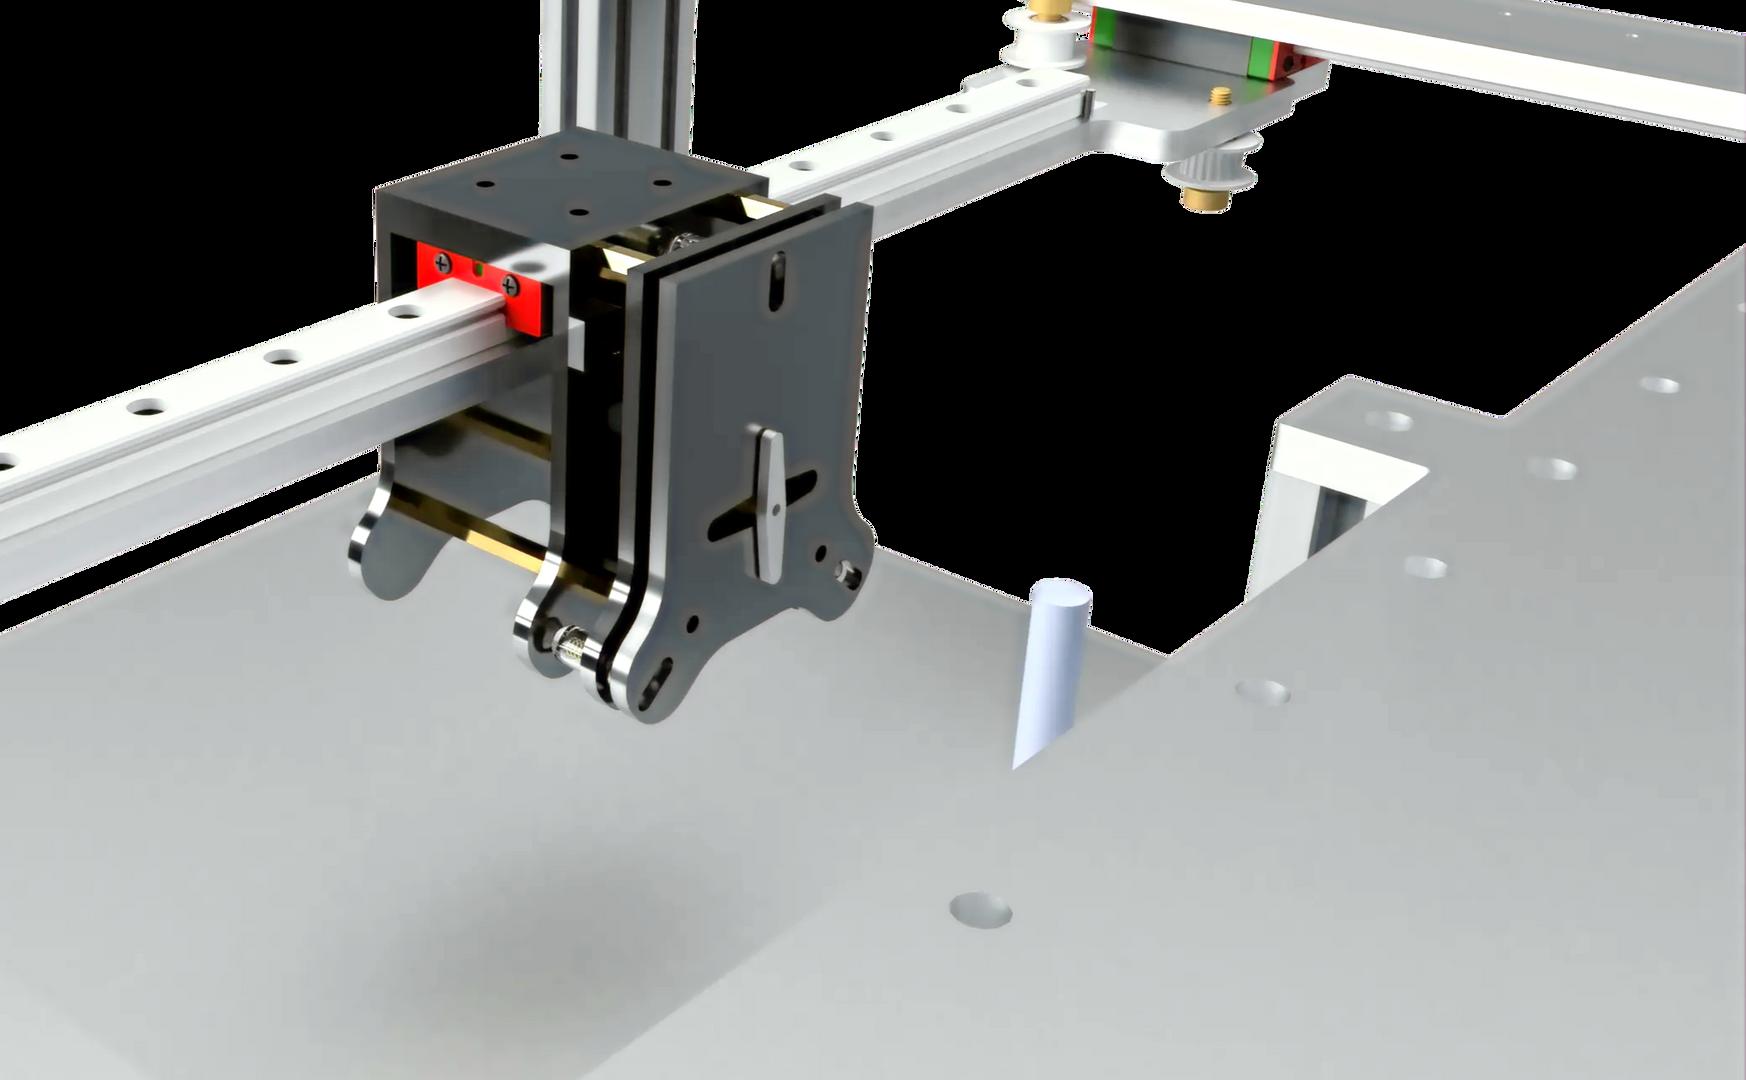 TOOL CHANGER 3D PRINTER